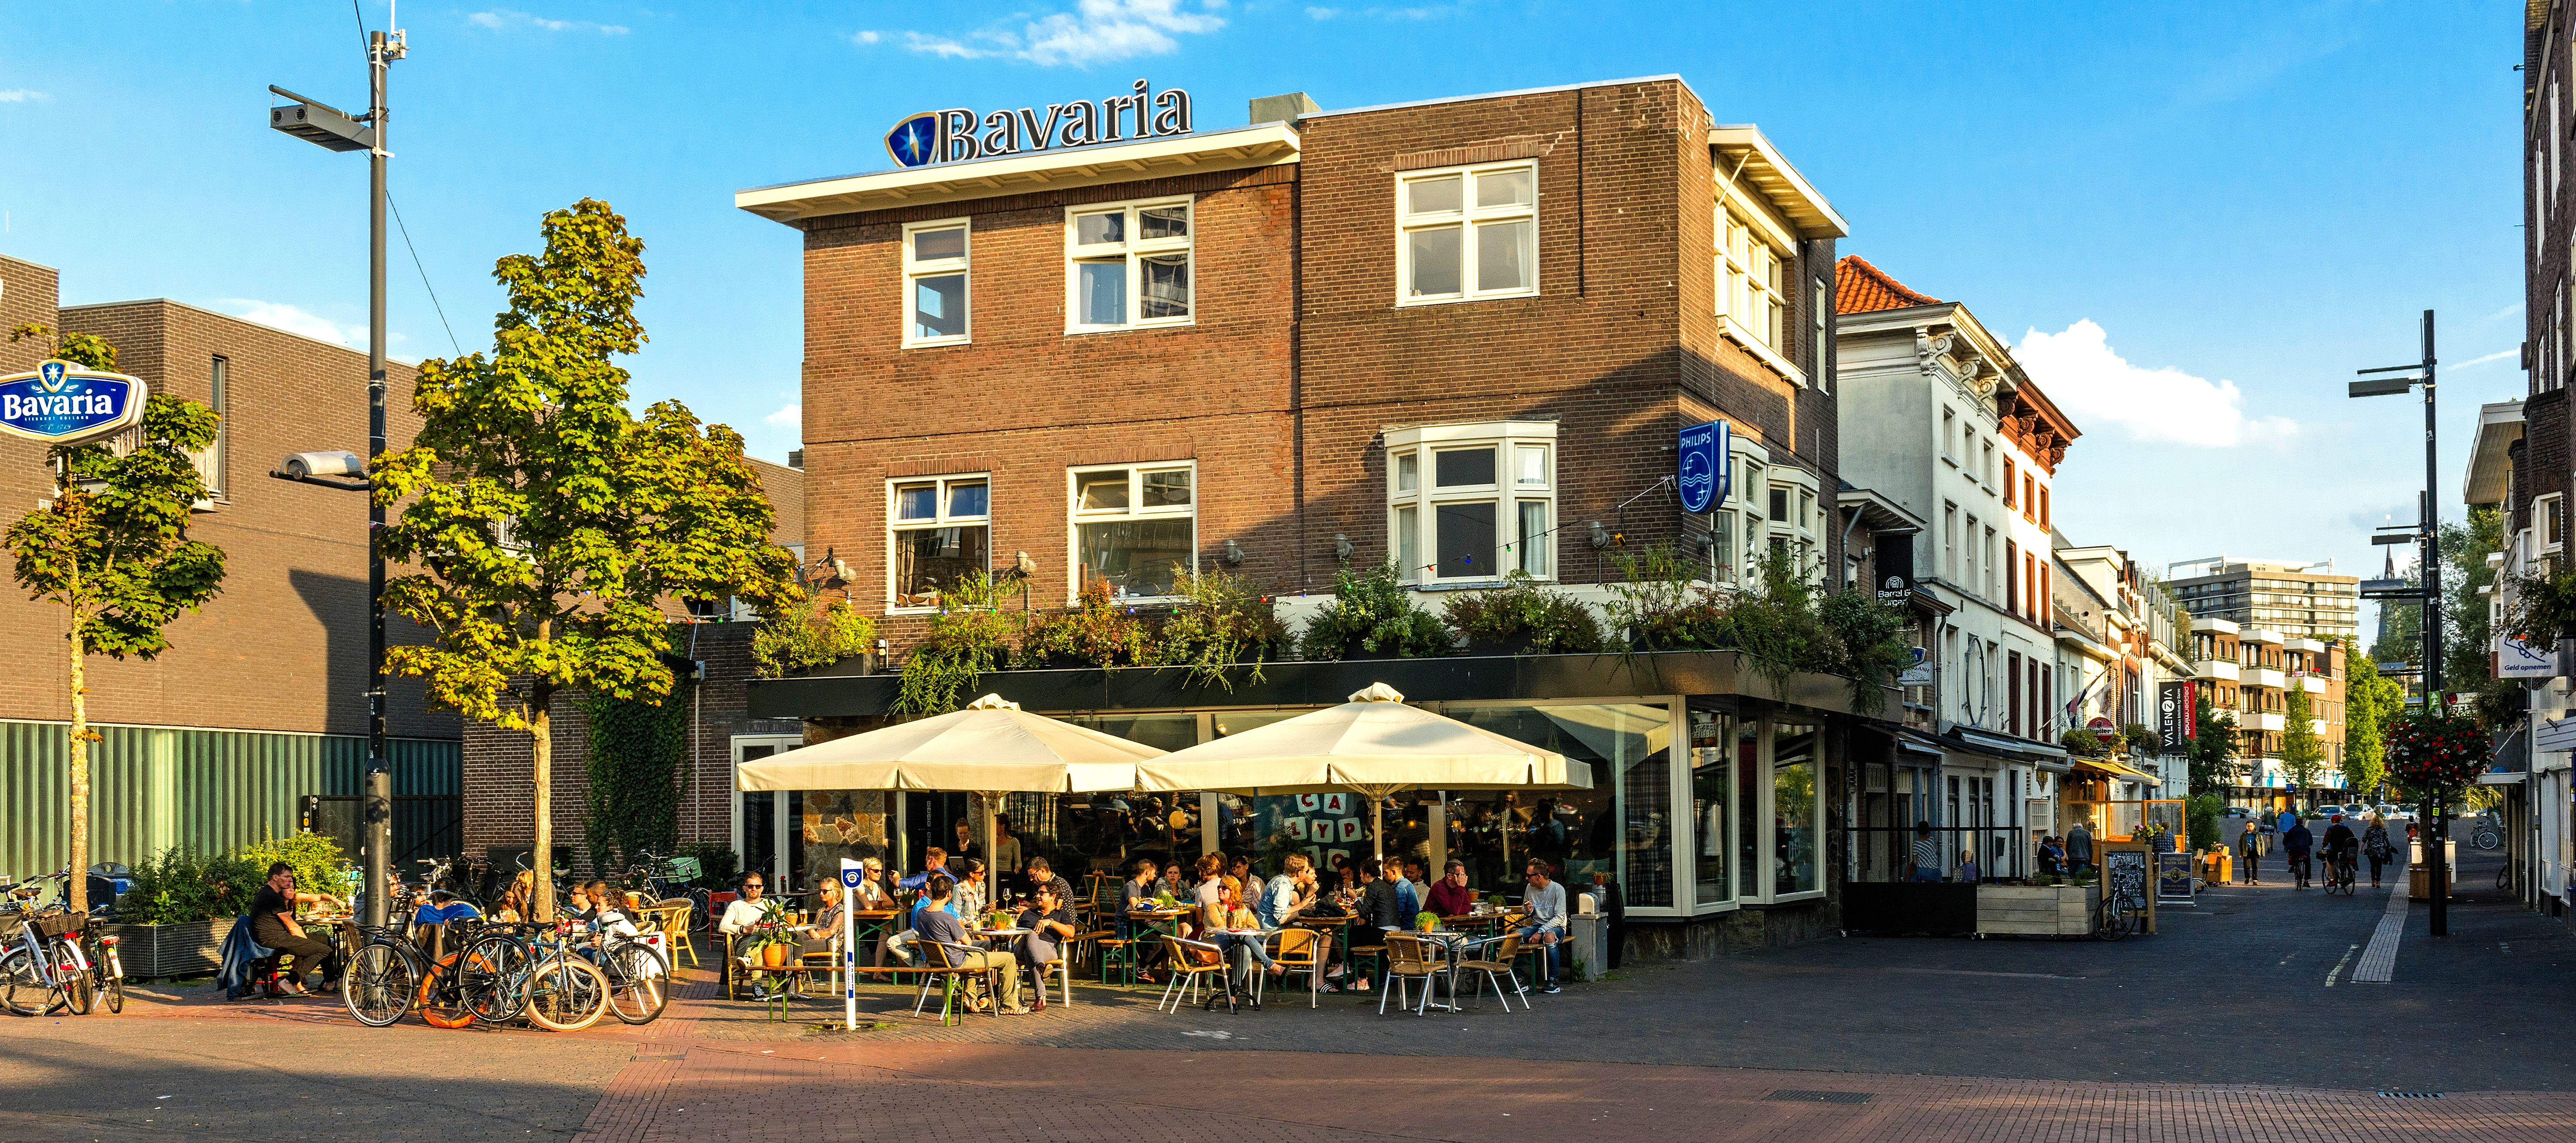 Eindhoven Hotspots » Archive Dinner @ Calypso Eindhoven